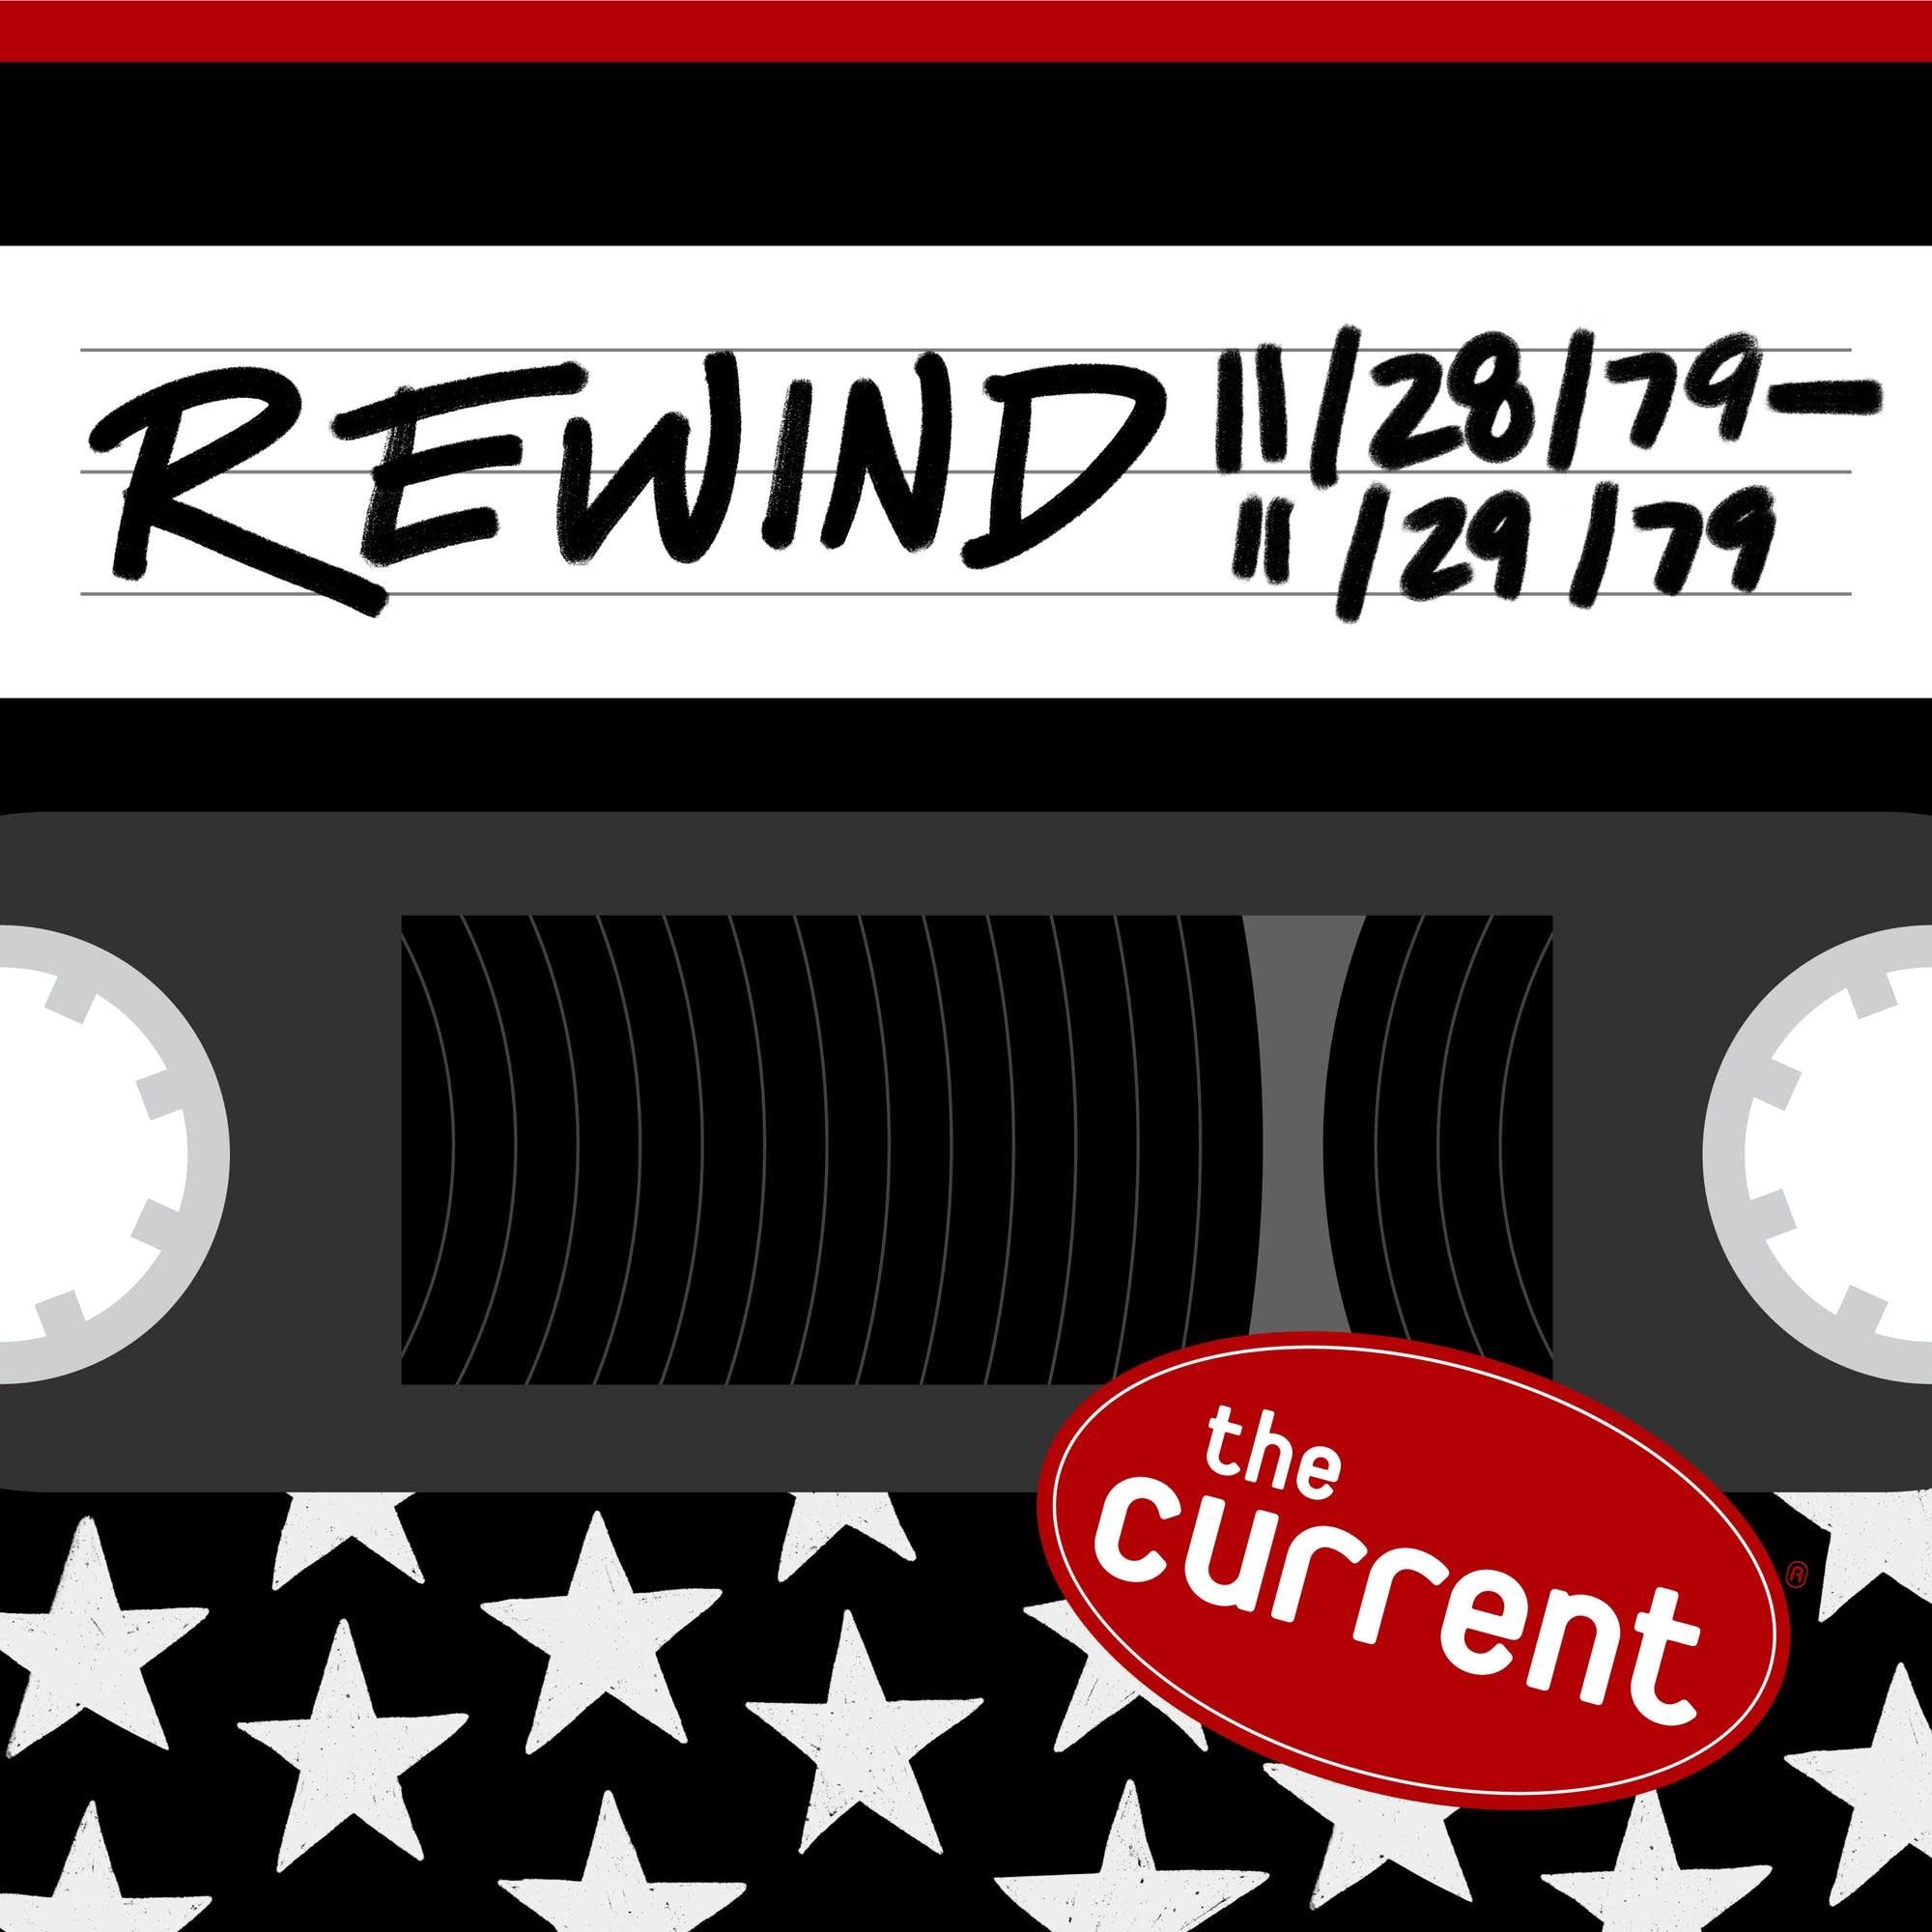 The Current Rewind: 11/28/79-11/29/79